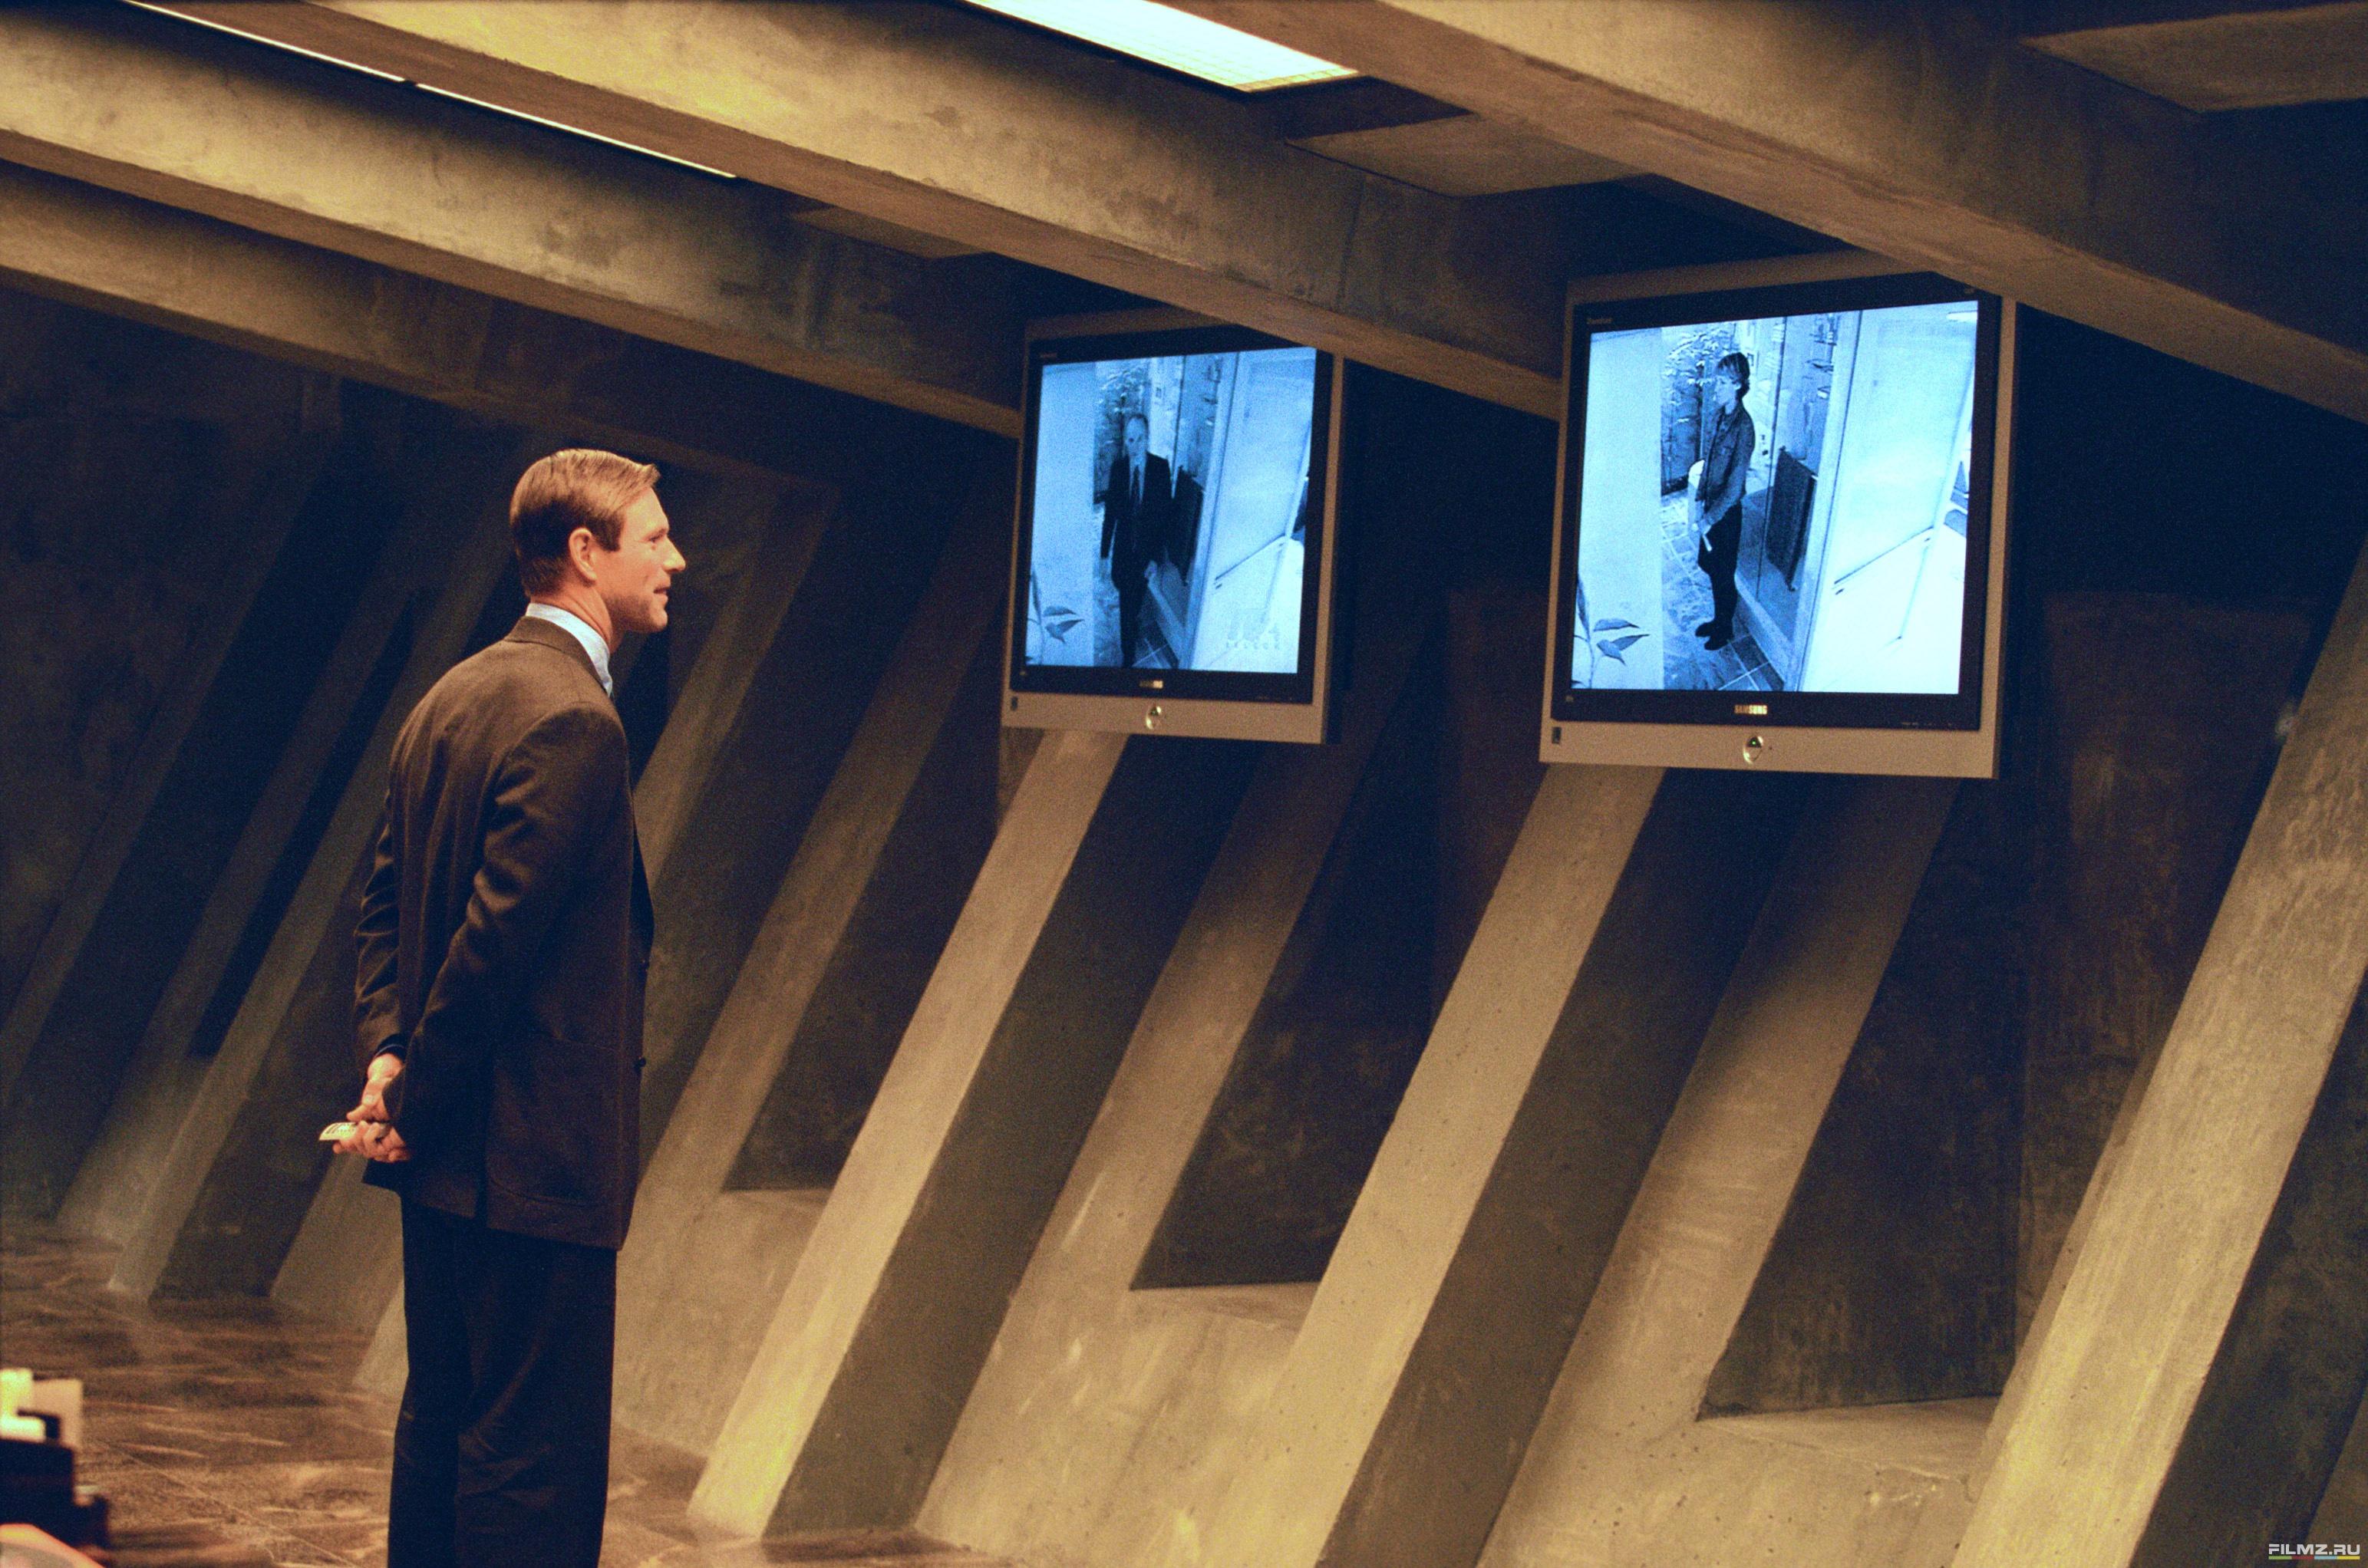 кадры из фильма Час расплаты Аарон Экхарт,